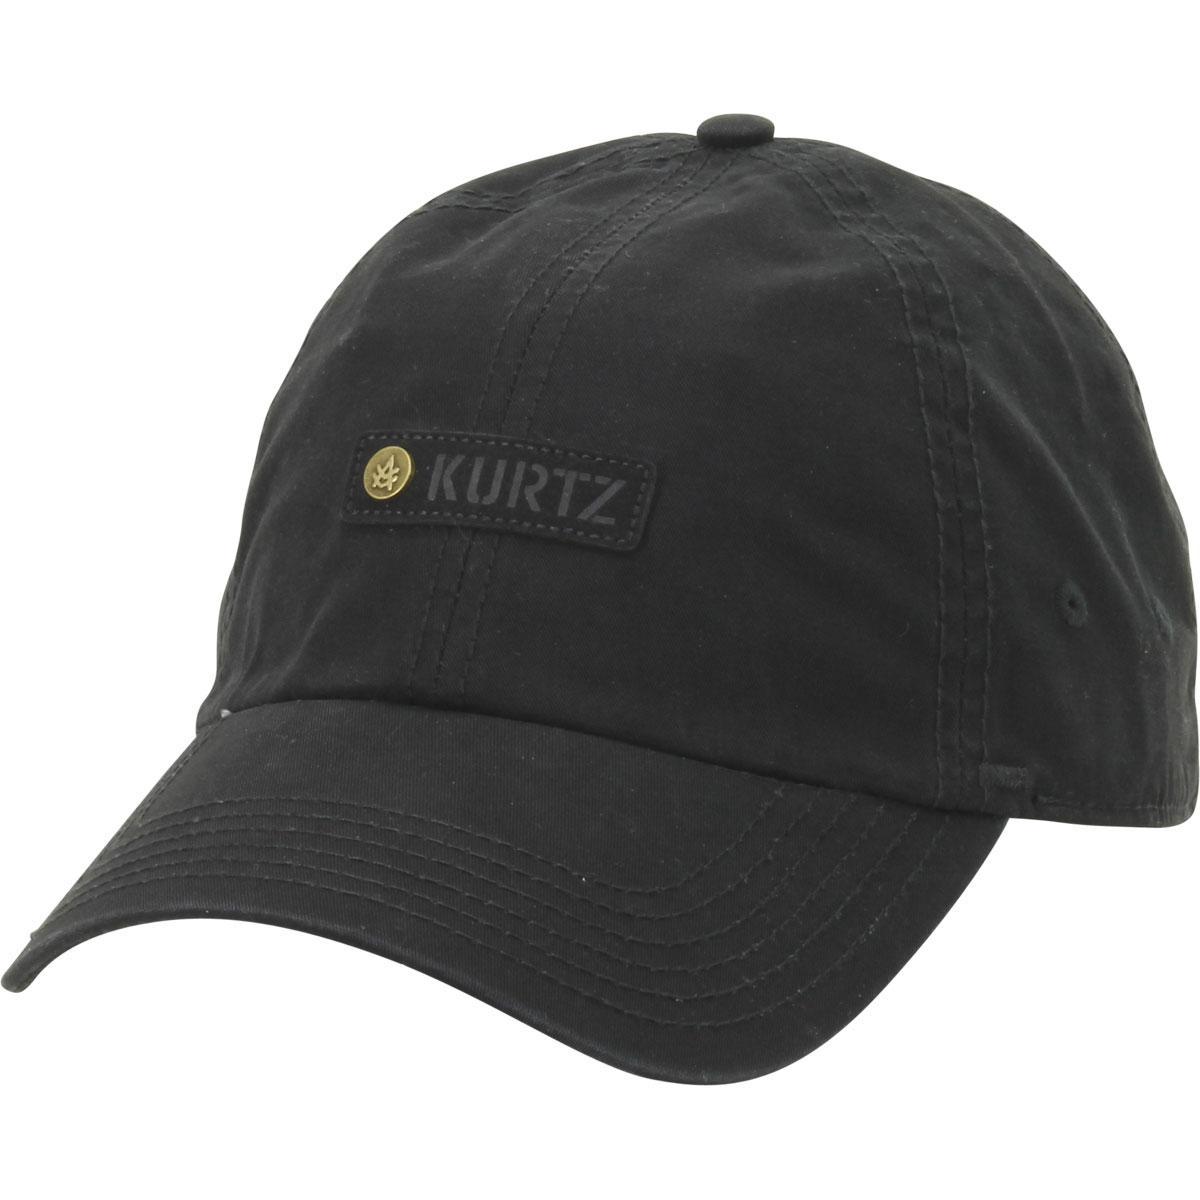 Image of Kurtz Men's Chino Corps Baseball Cap Hat - Black  - One Size Fits Most